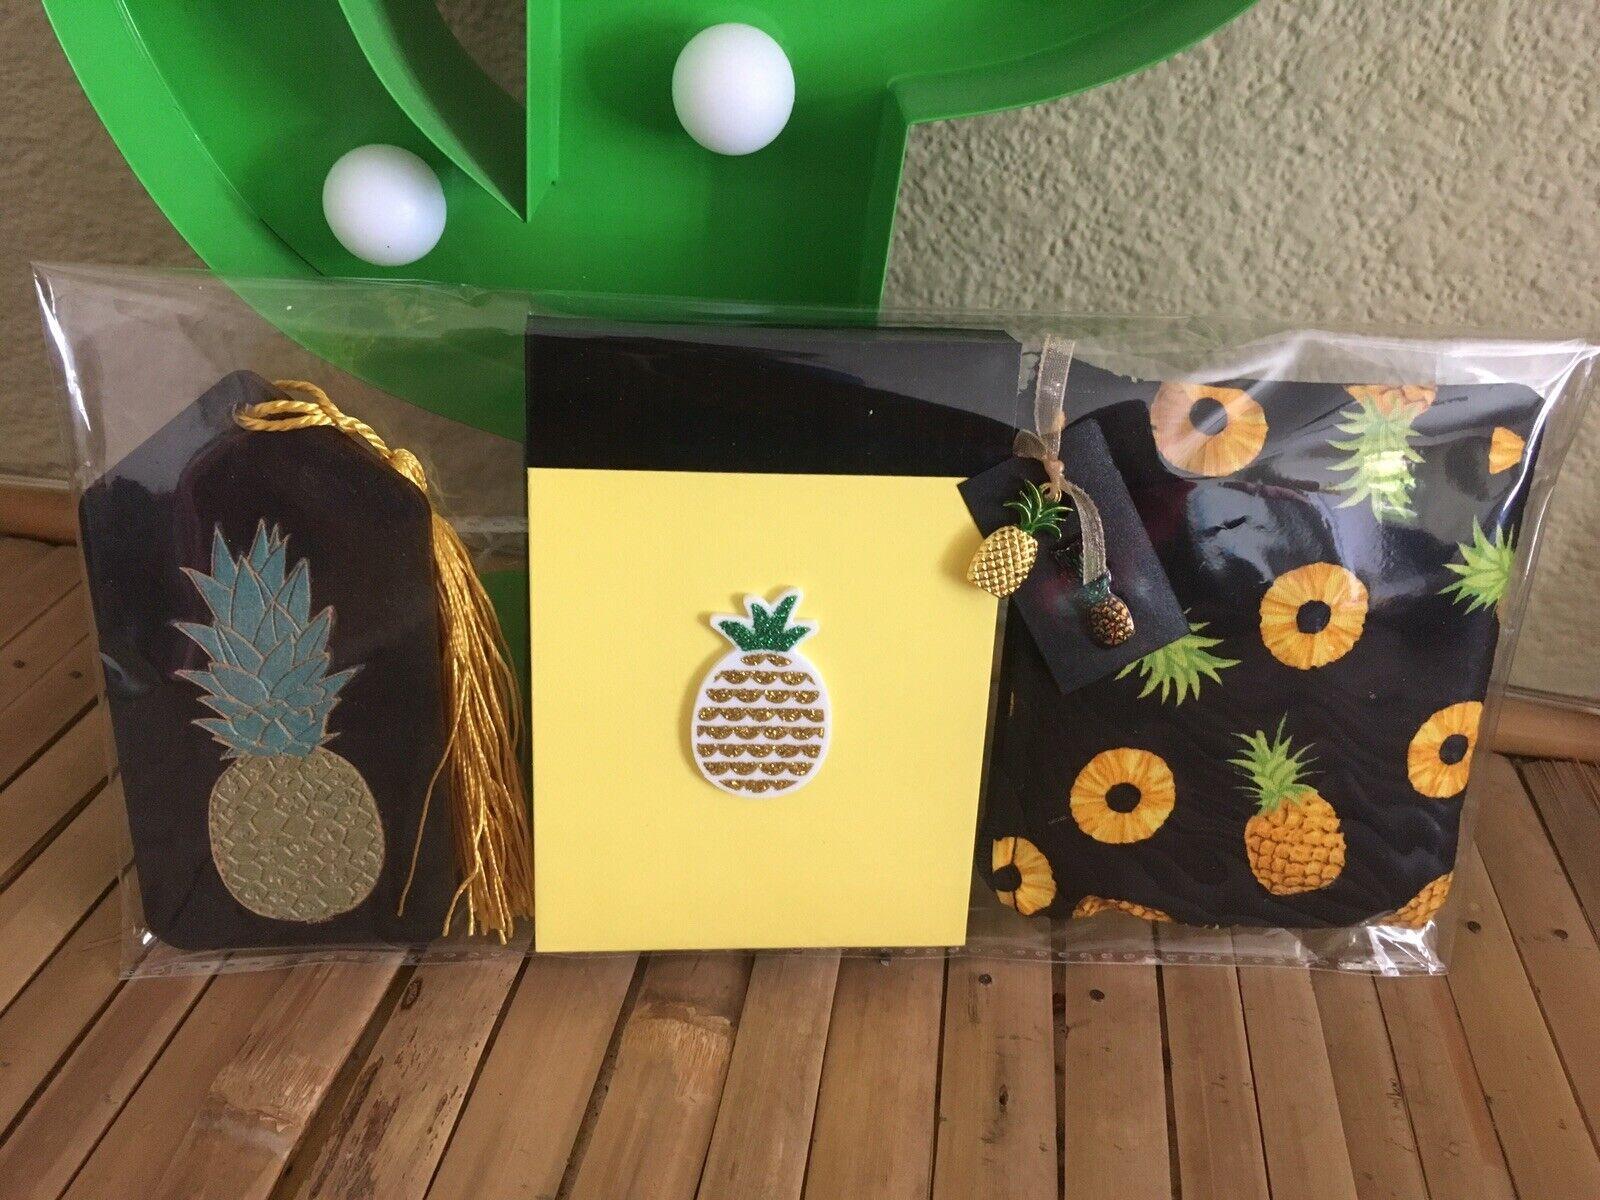 Retro Tiki 🍍Pineapple Luggage Tag/label +Notebook +Charm Purse 3pc Gift Set